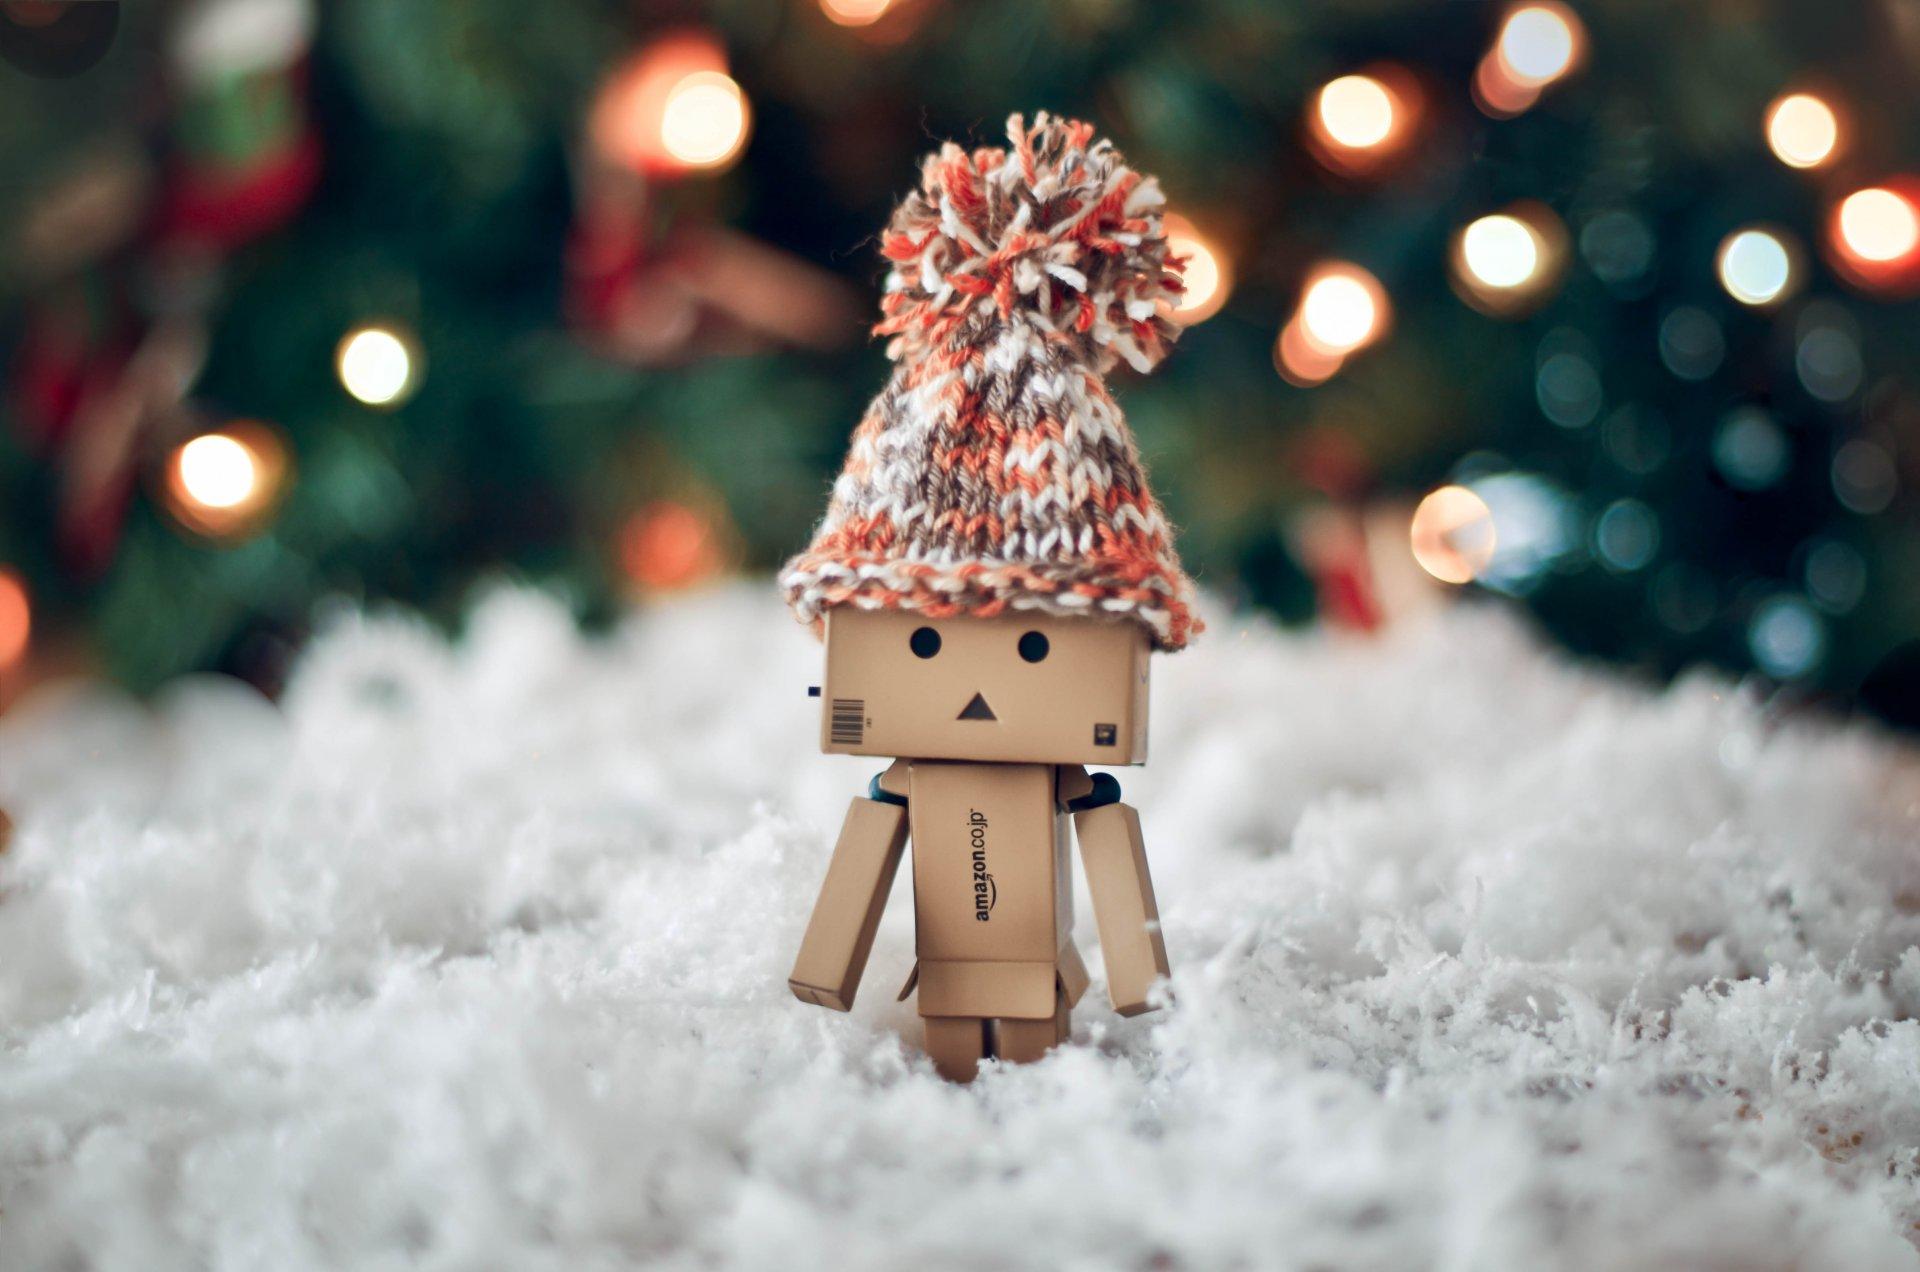 Тумблер картинки на новый год